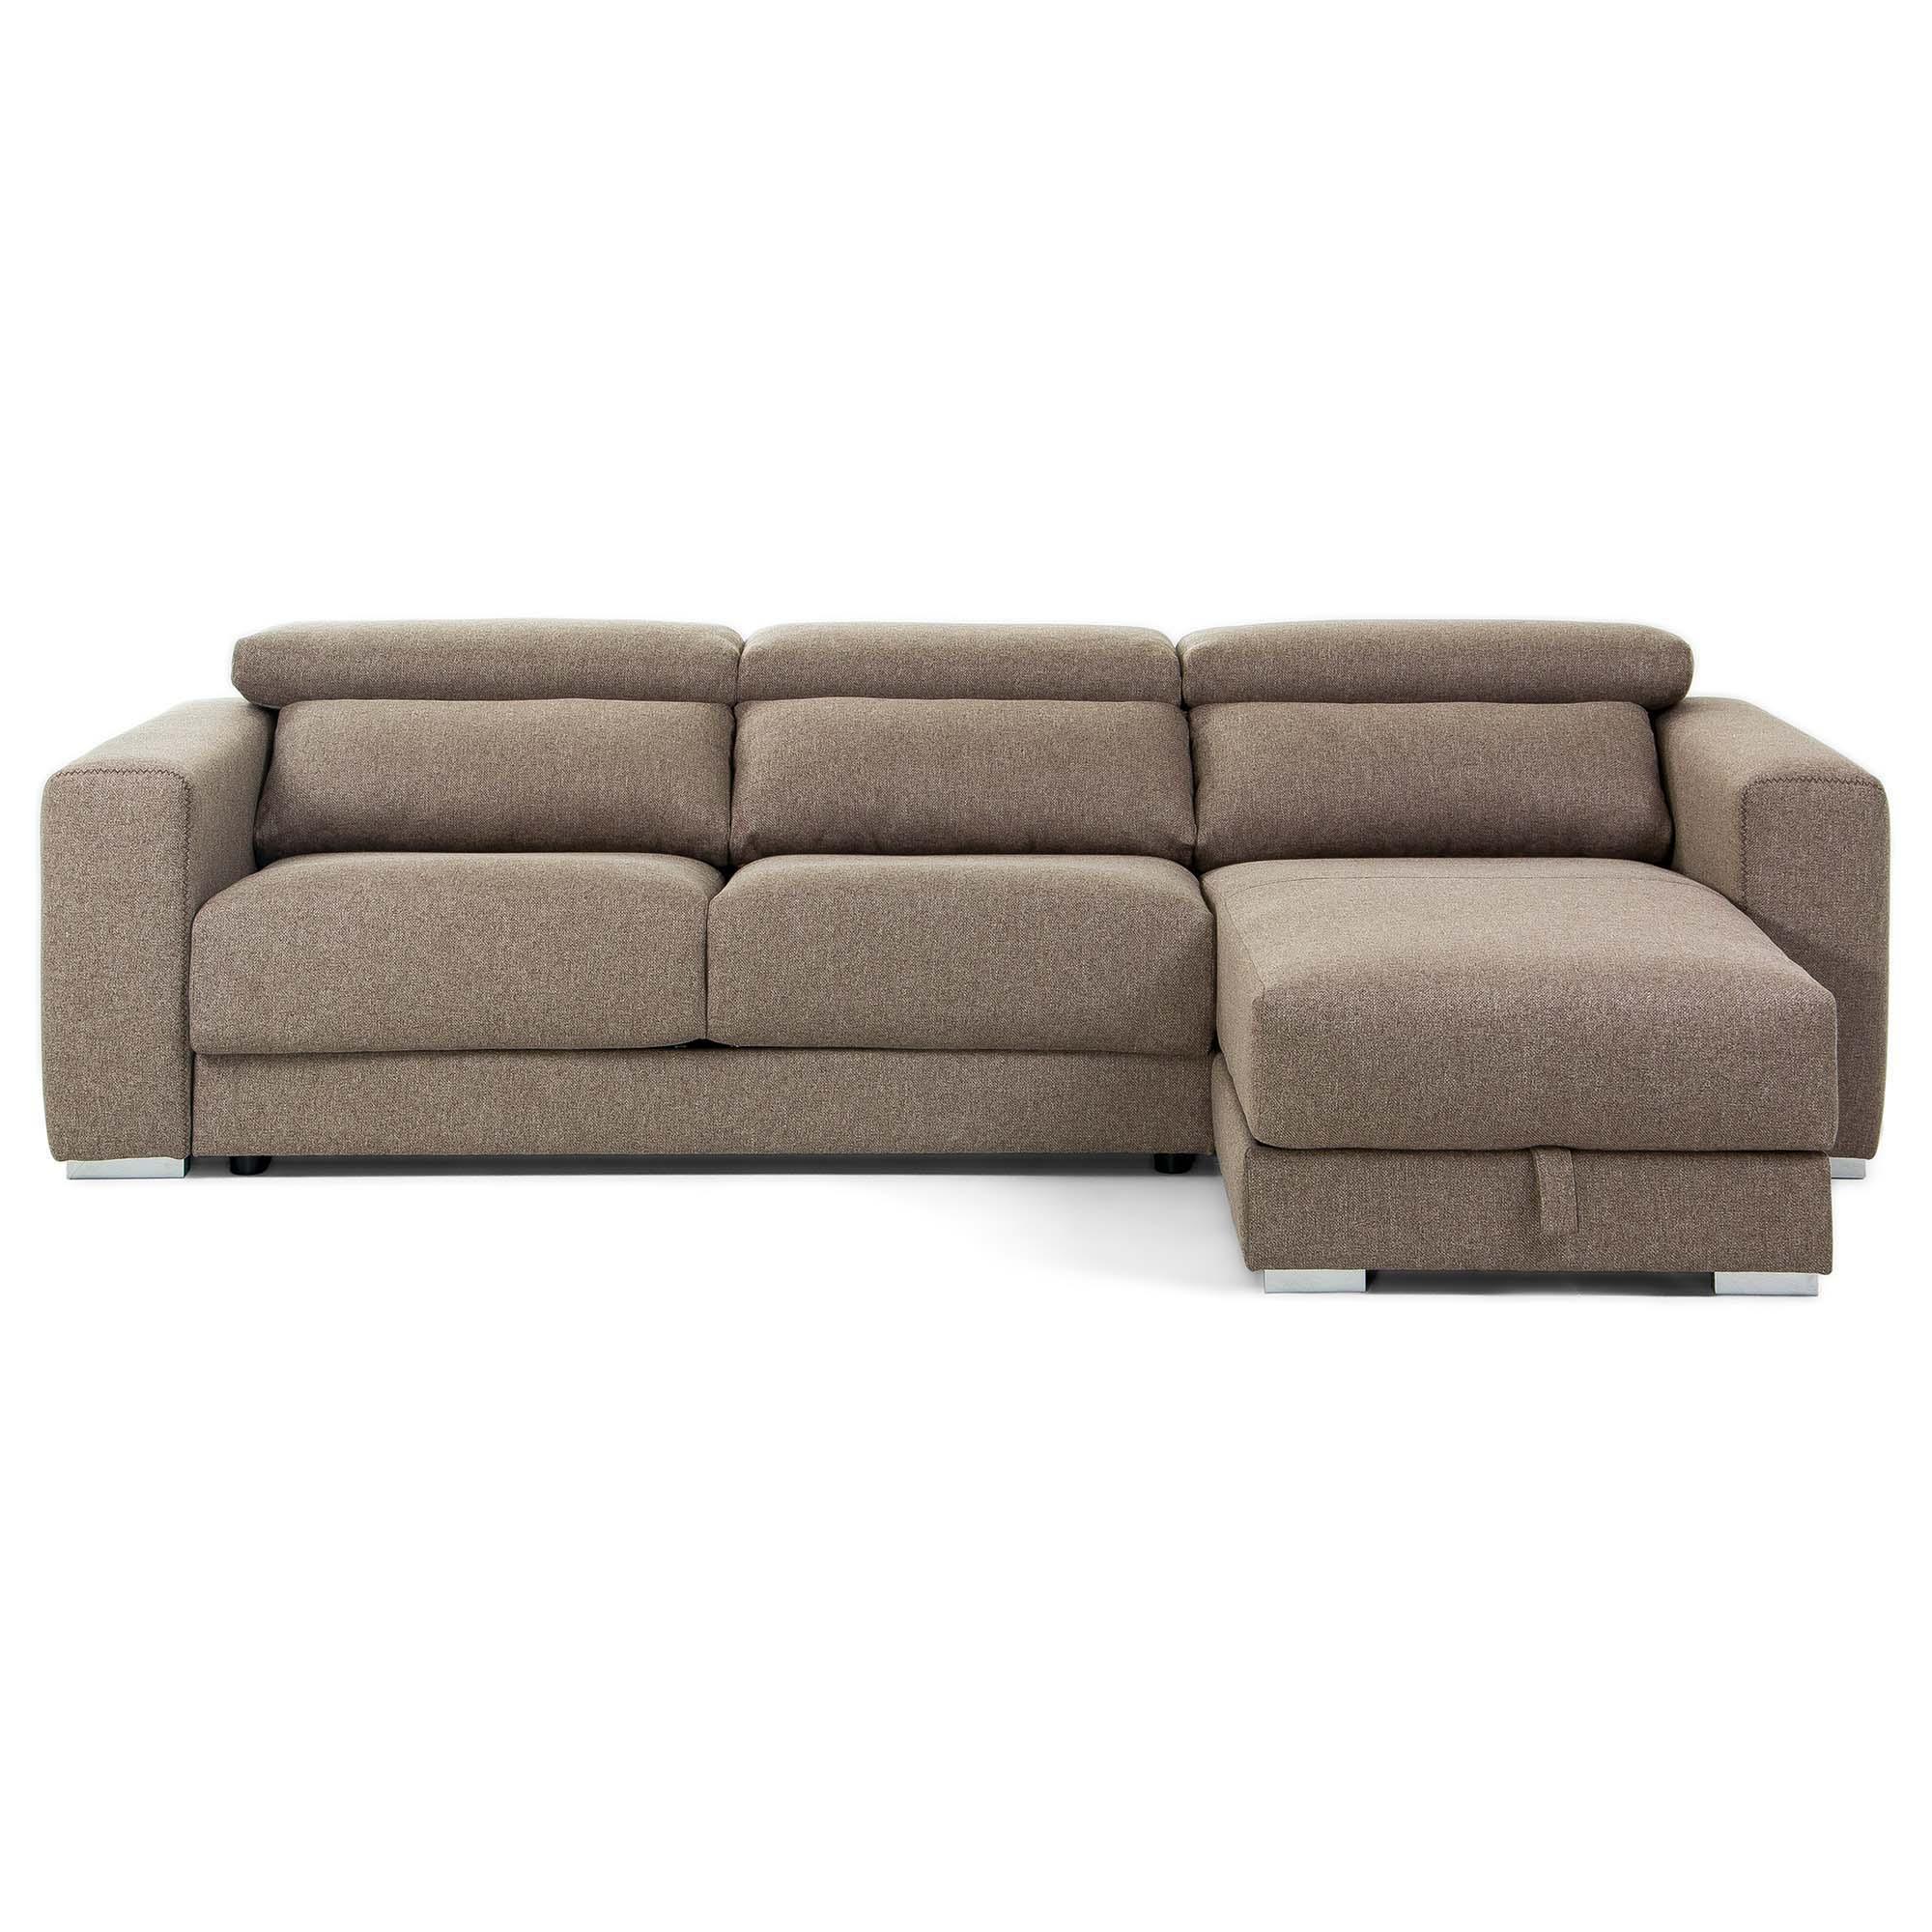 Atlanta 3-zitsbank chaise longue bruin 290 cm